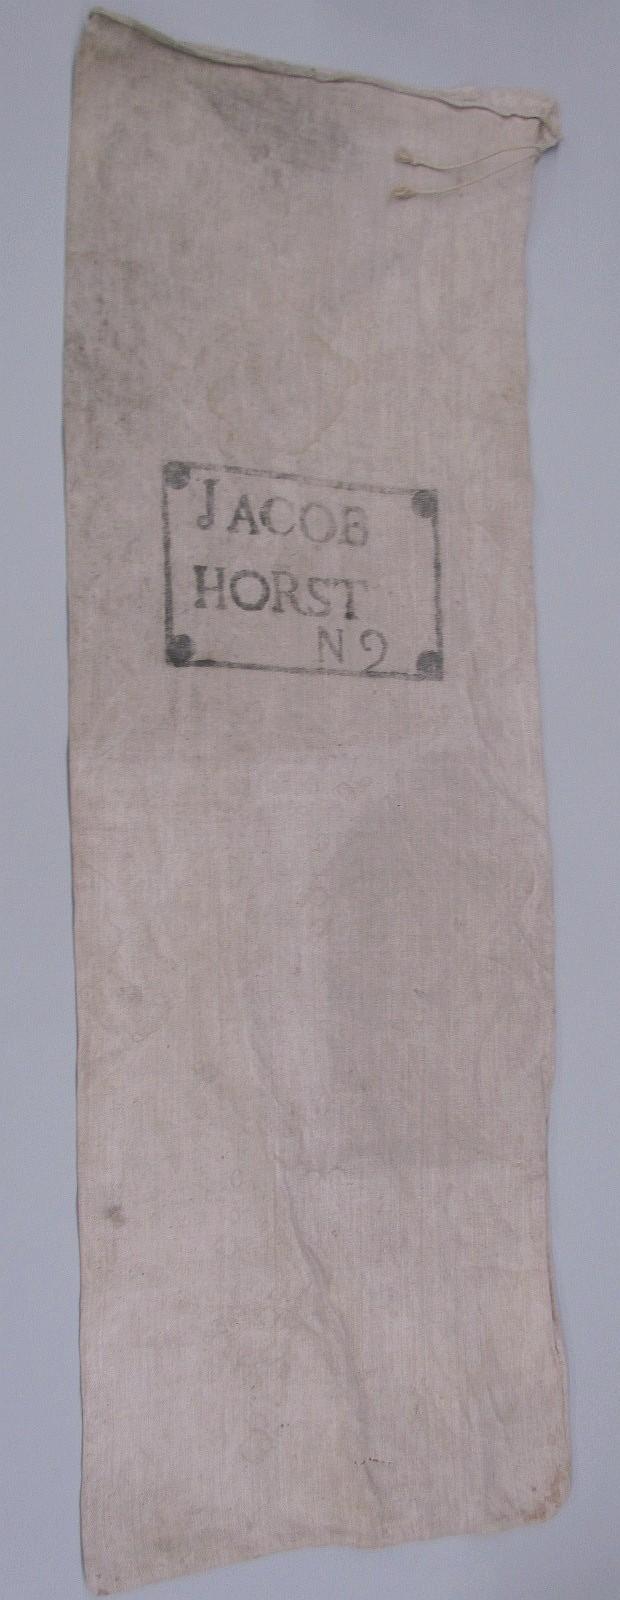 Early homespun linen feedbag of Jacob Horst